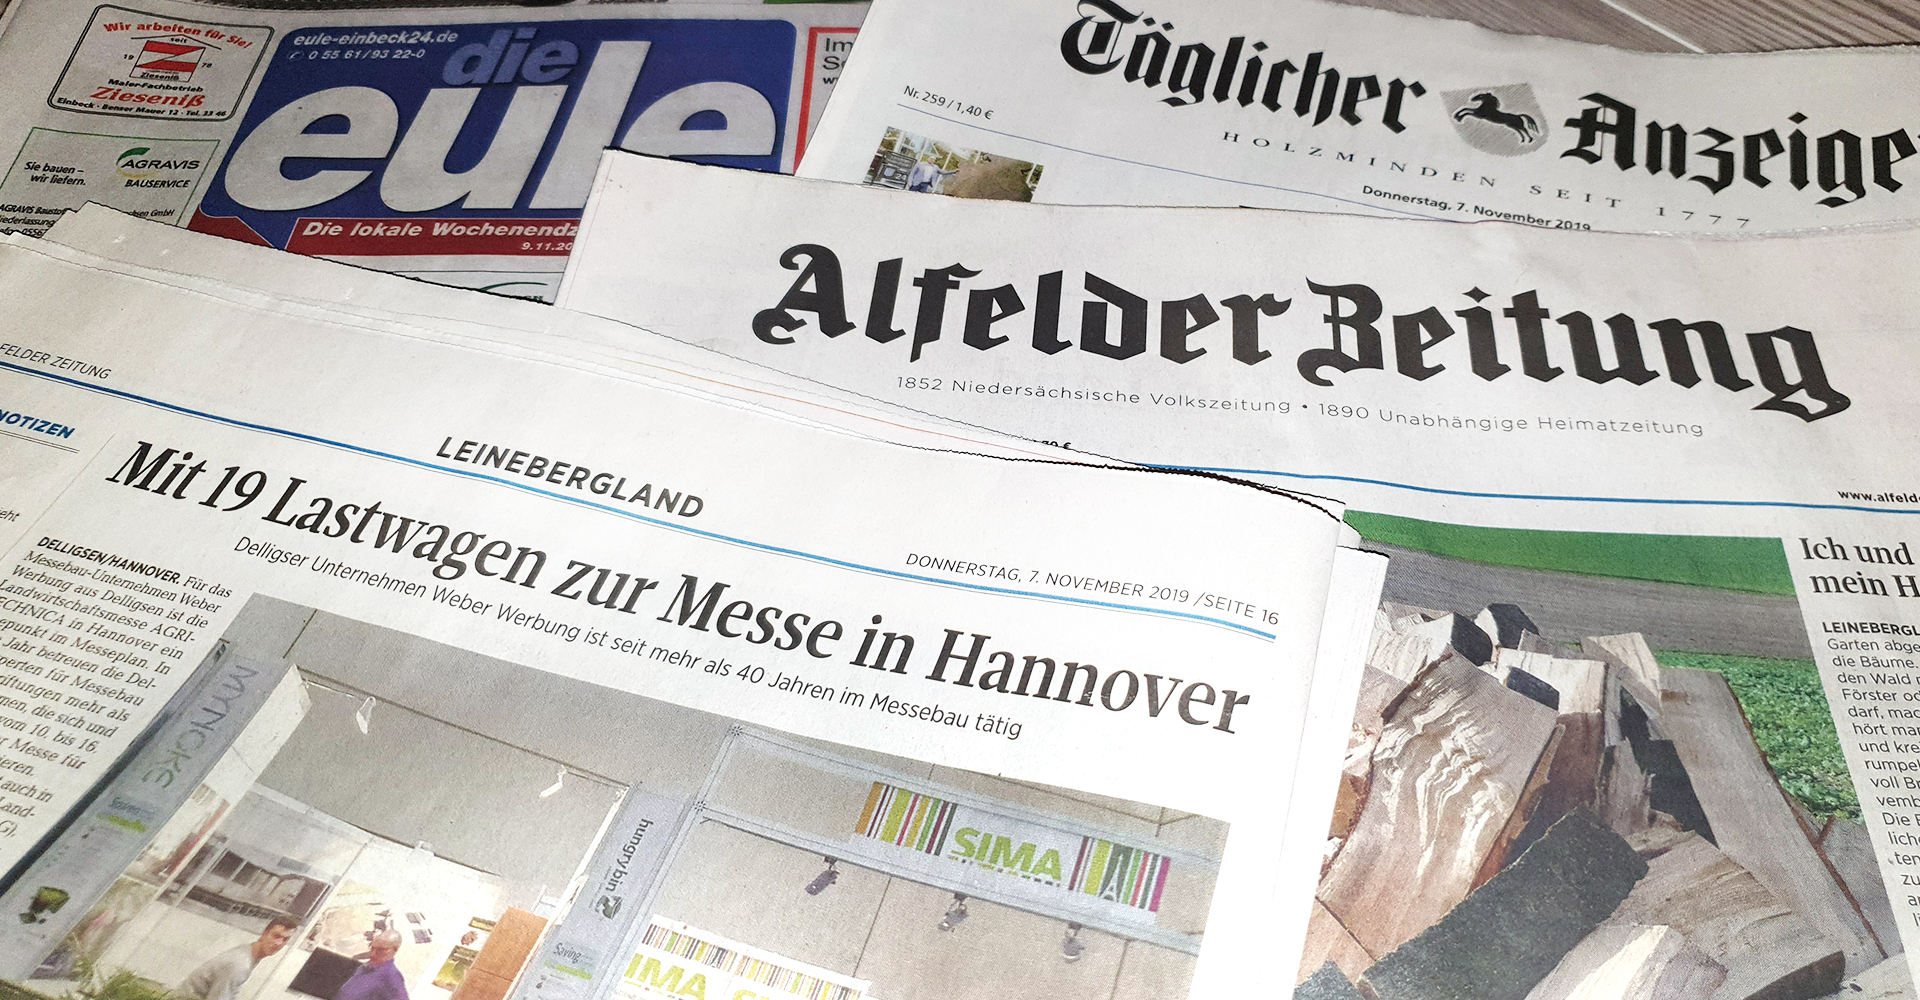 Alfelder Zeitung TAH Eule Weber Werbung Agritechnica